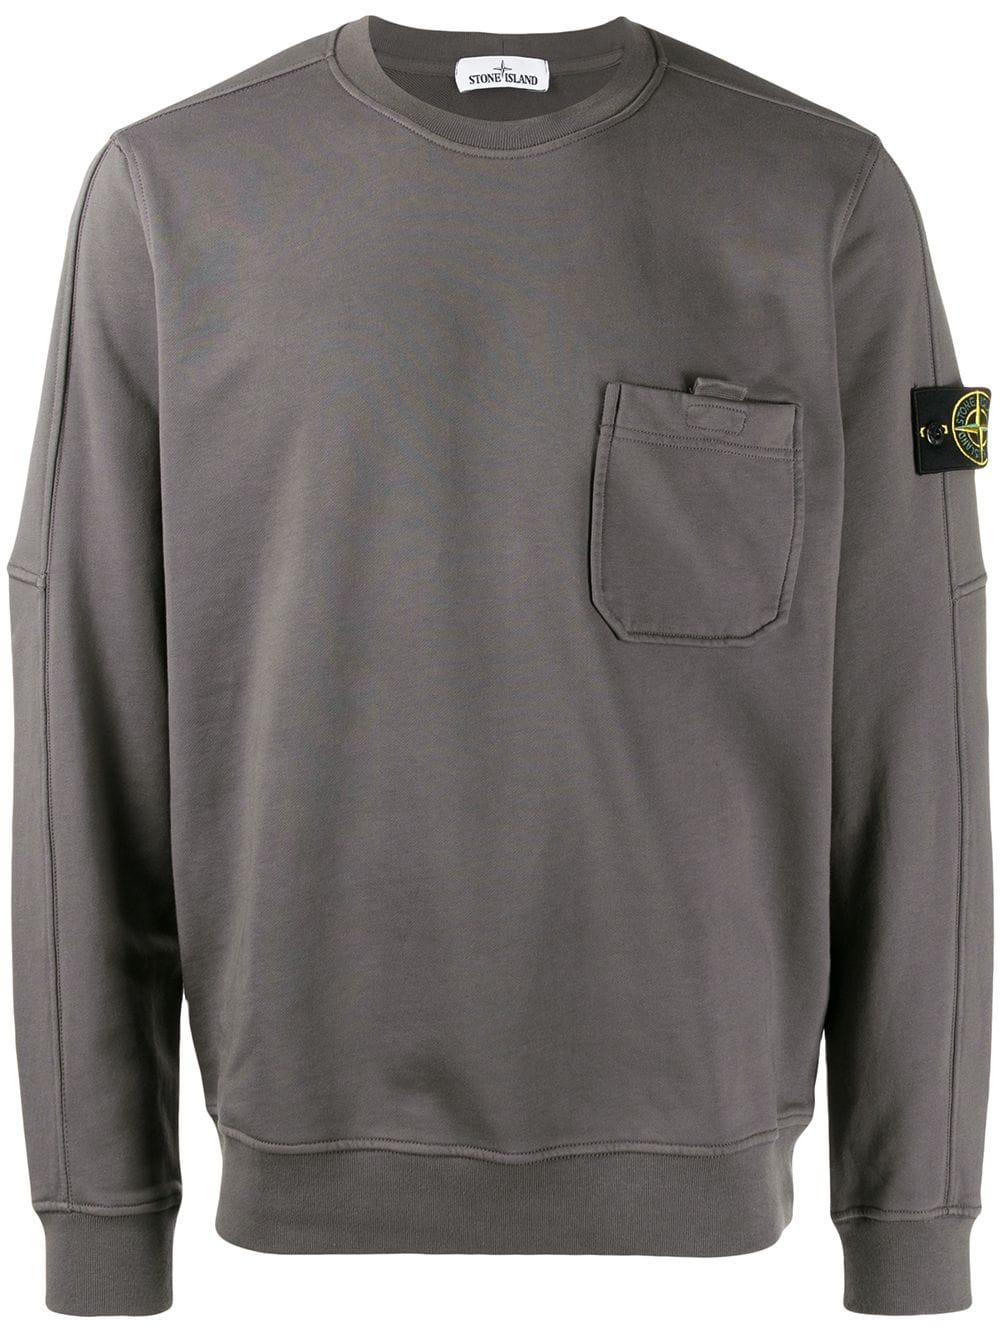 Stone Island Chest Pocket Sweatshirt In Grey Modesens Pocket Sweatshirt Sweatshirts Stone Island